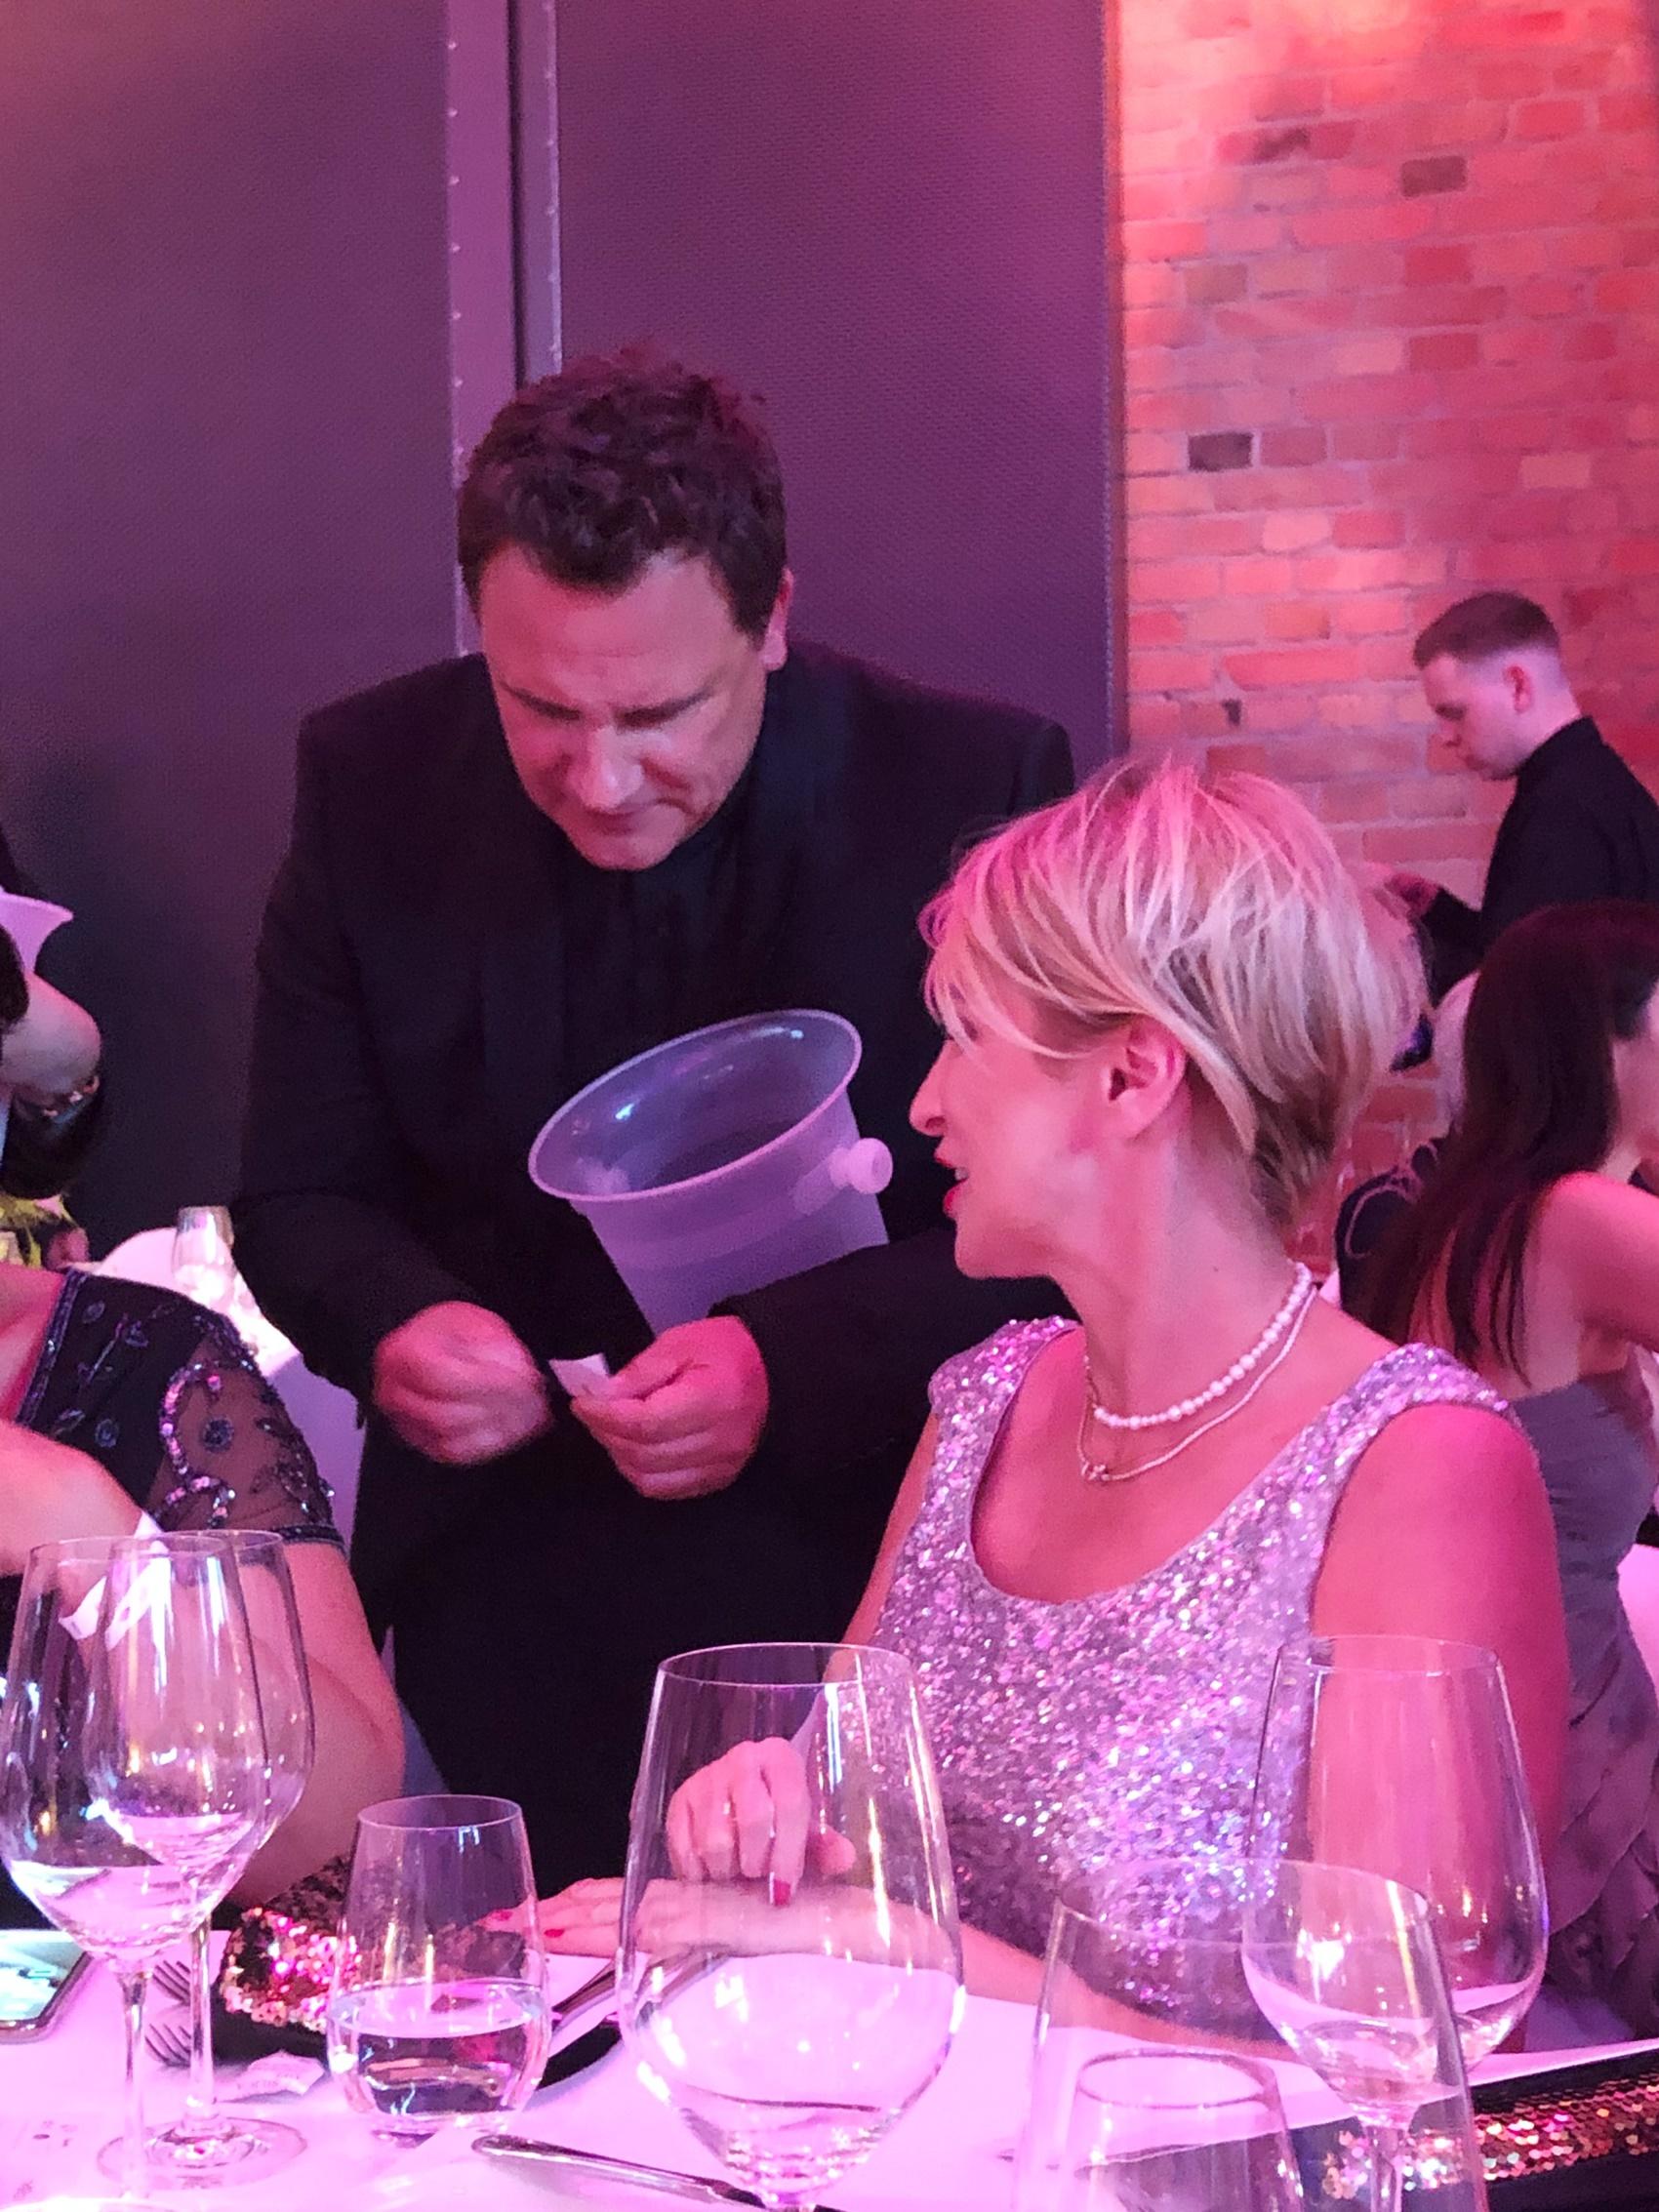 glamupyourlifestyle dresscode black-tie Abendkleid smoking Gala ball DKMS-Life ü-40-blog ü-50-blog ue-40-blog